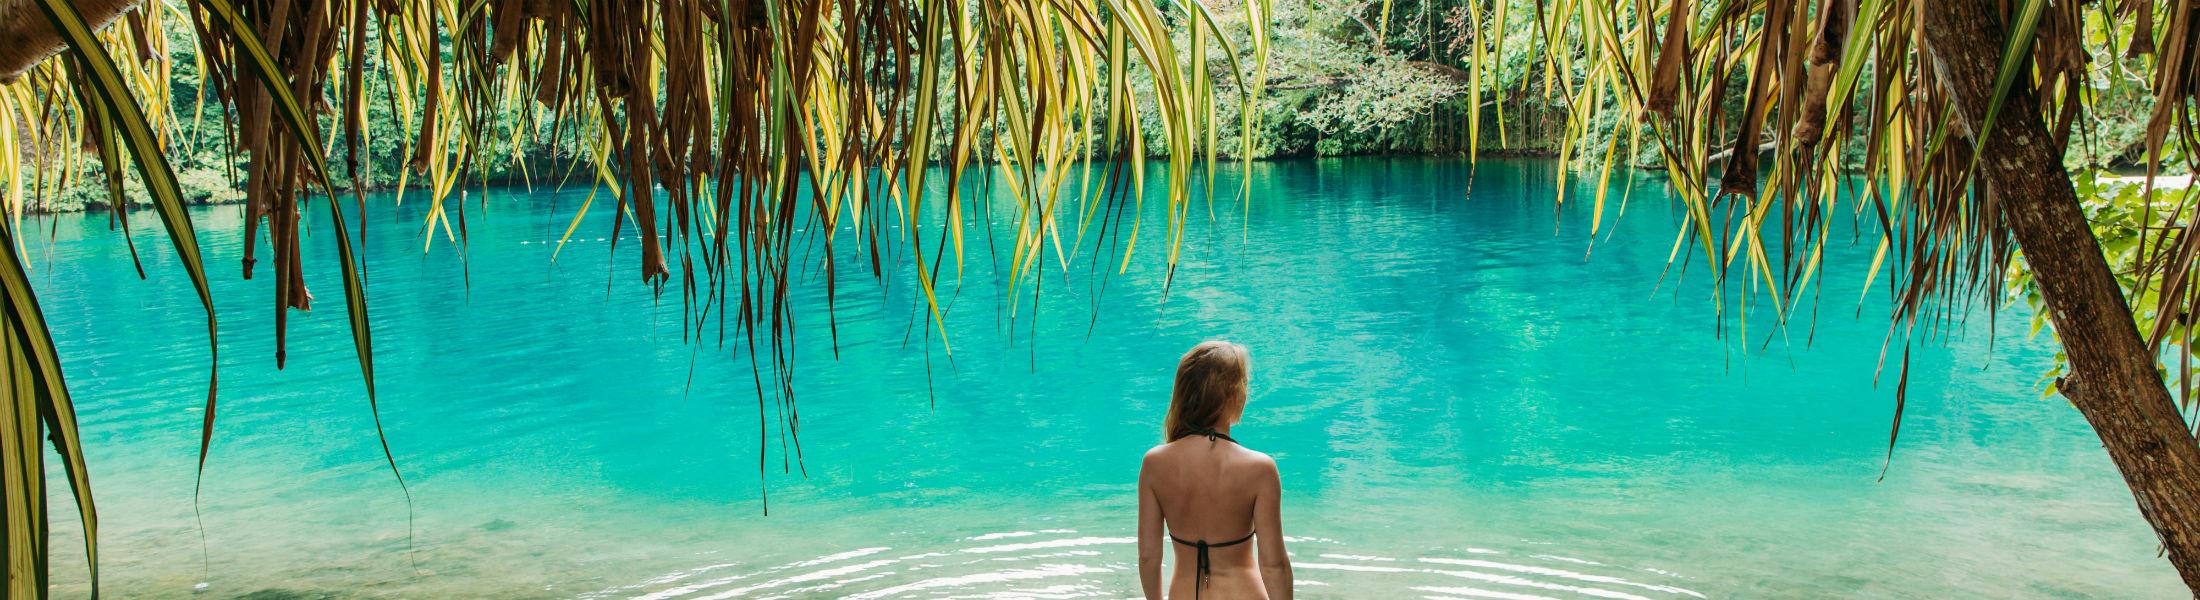 Girl in blue lagoon Jamaica